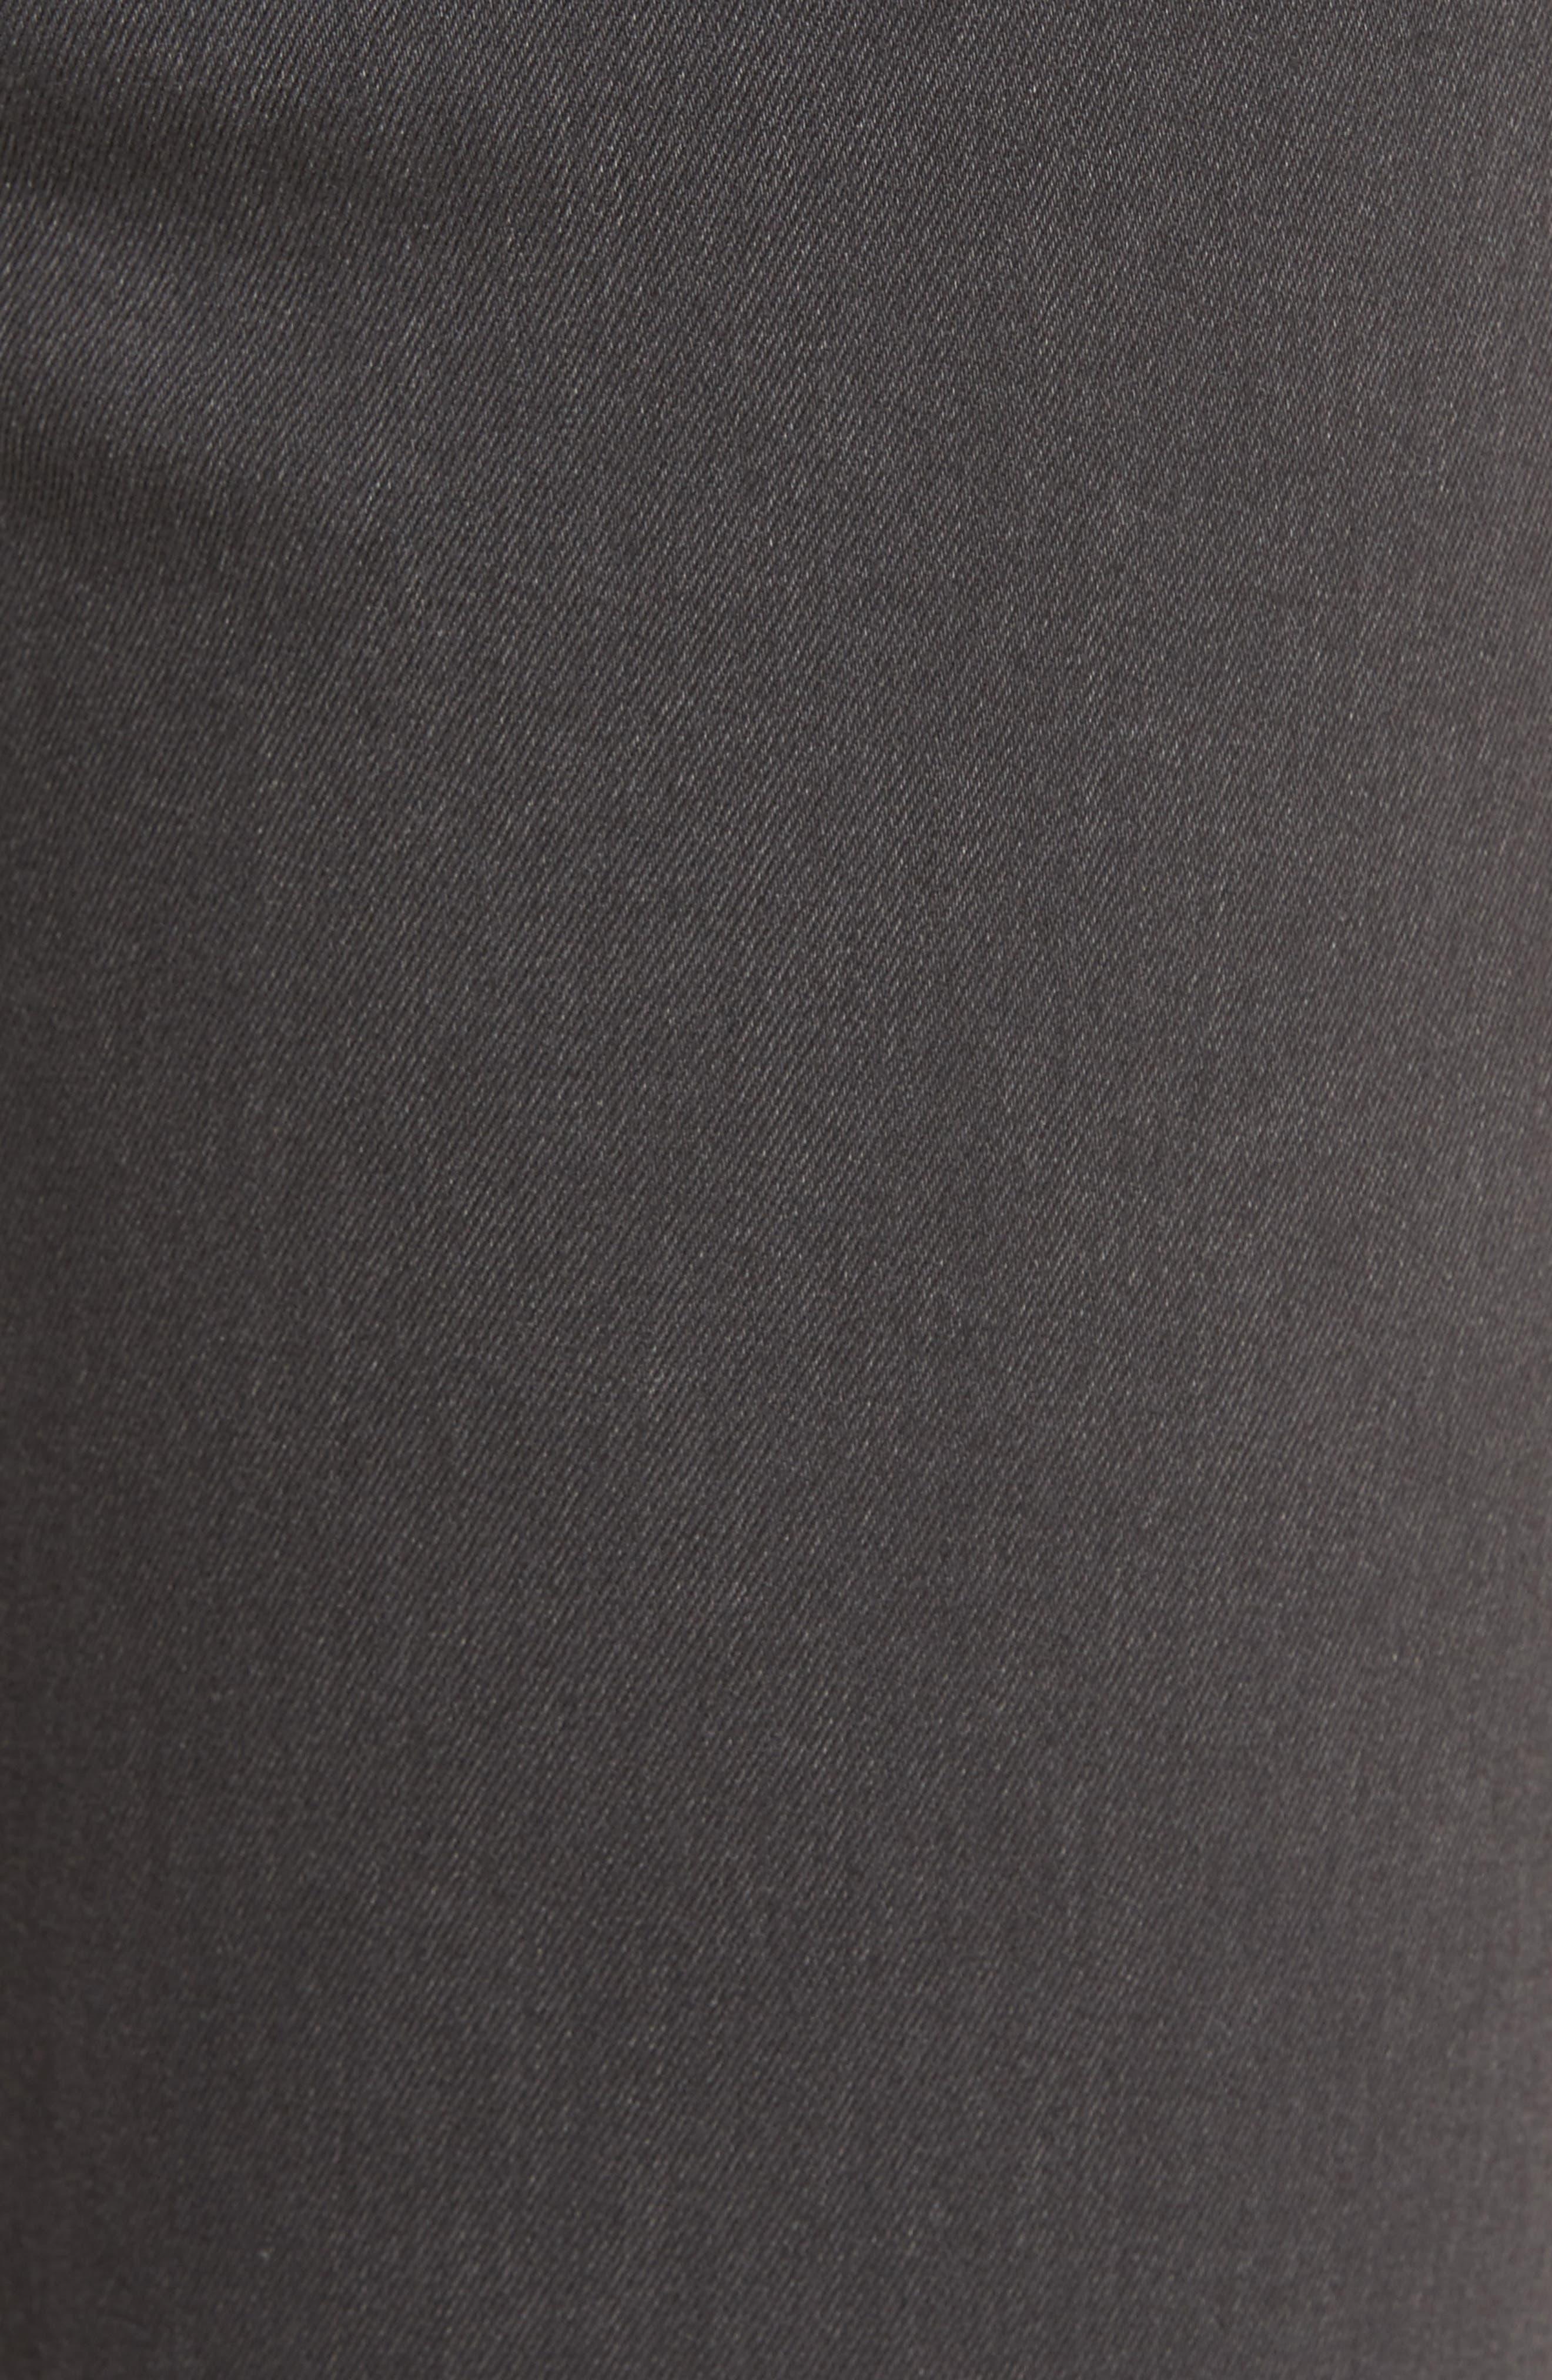 Rocket Petite High Waist Skinny Jeans,                             Alternate thumbnail 5, color,                             034